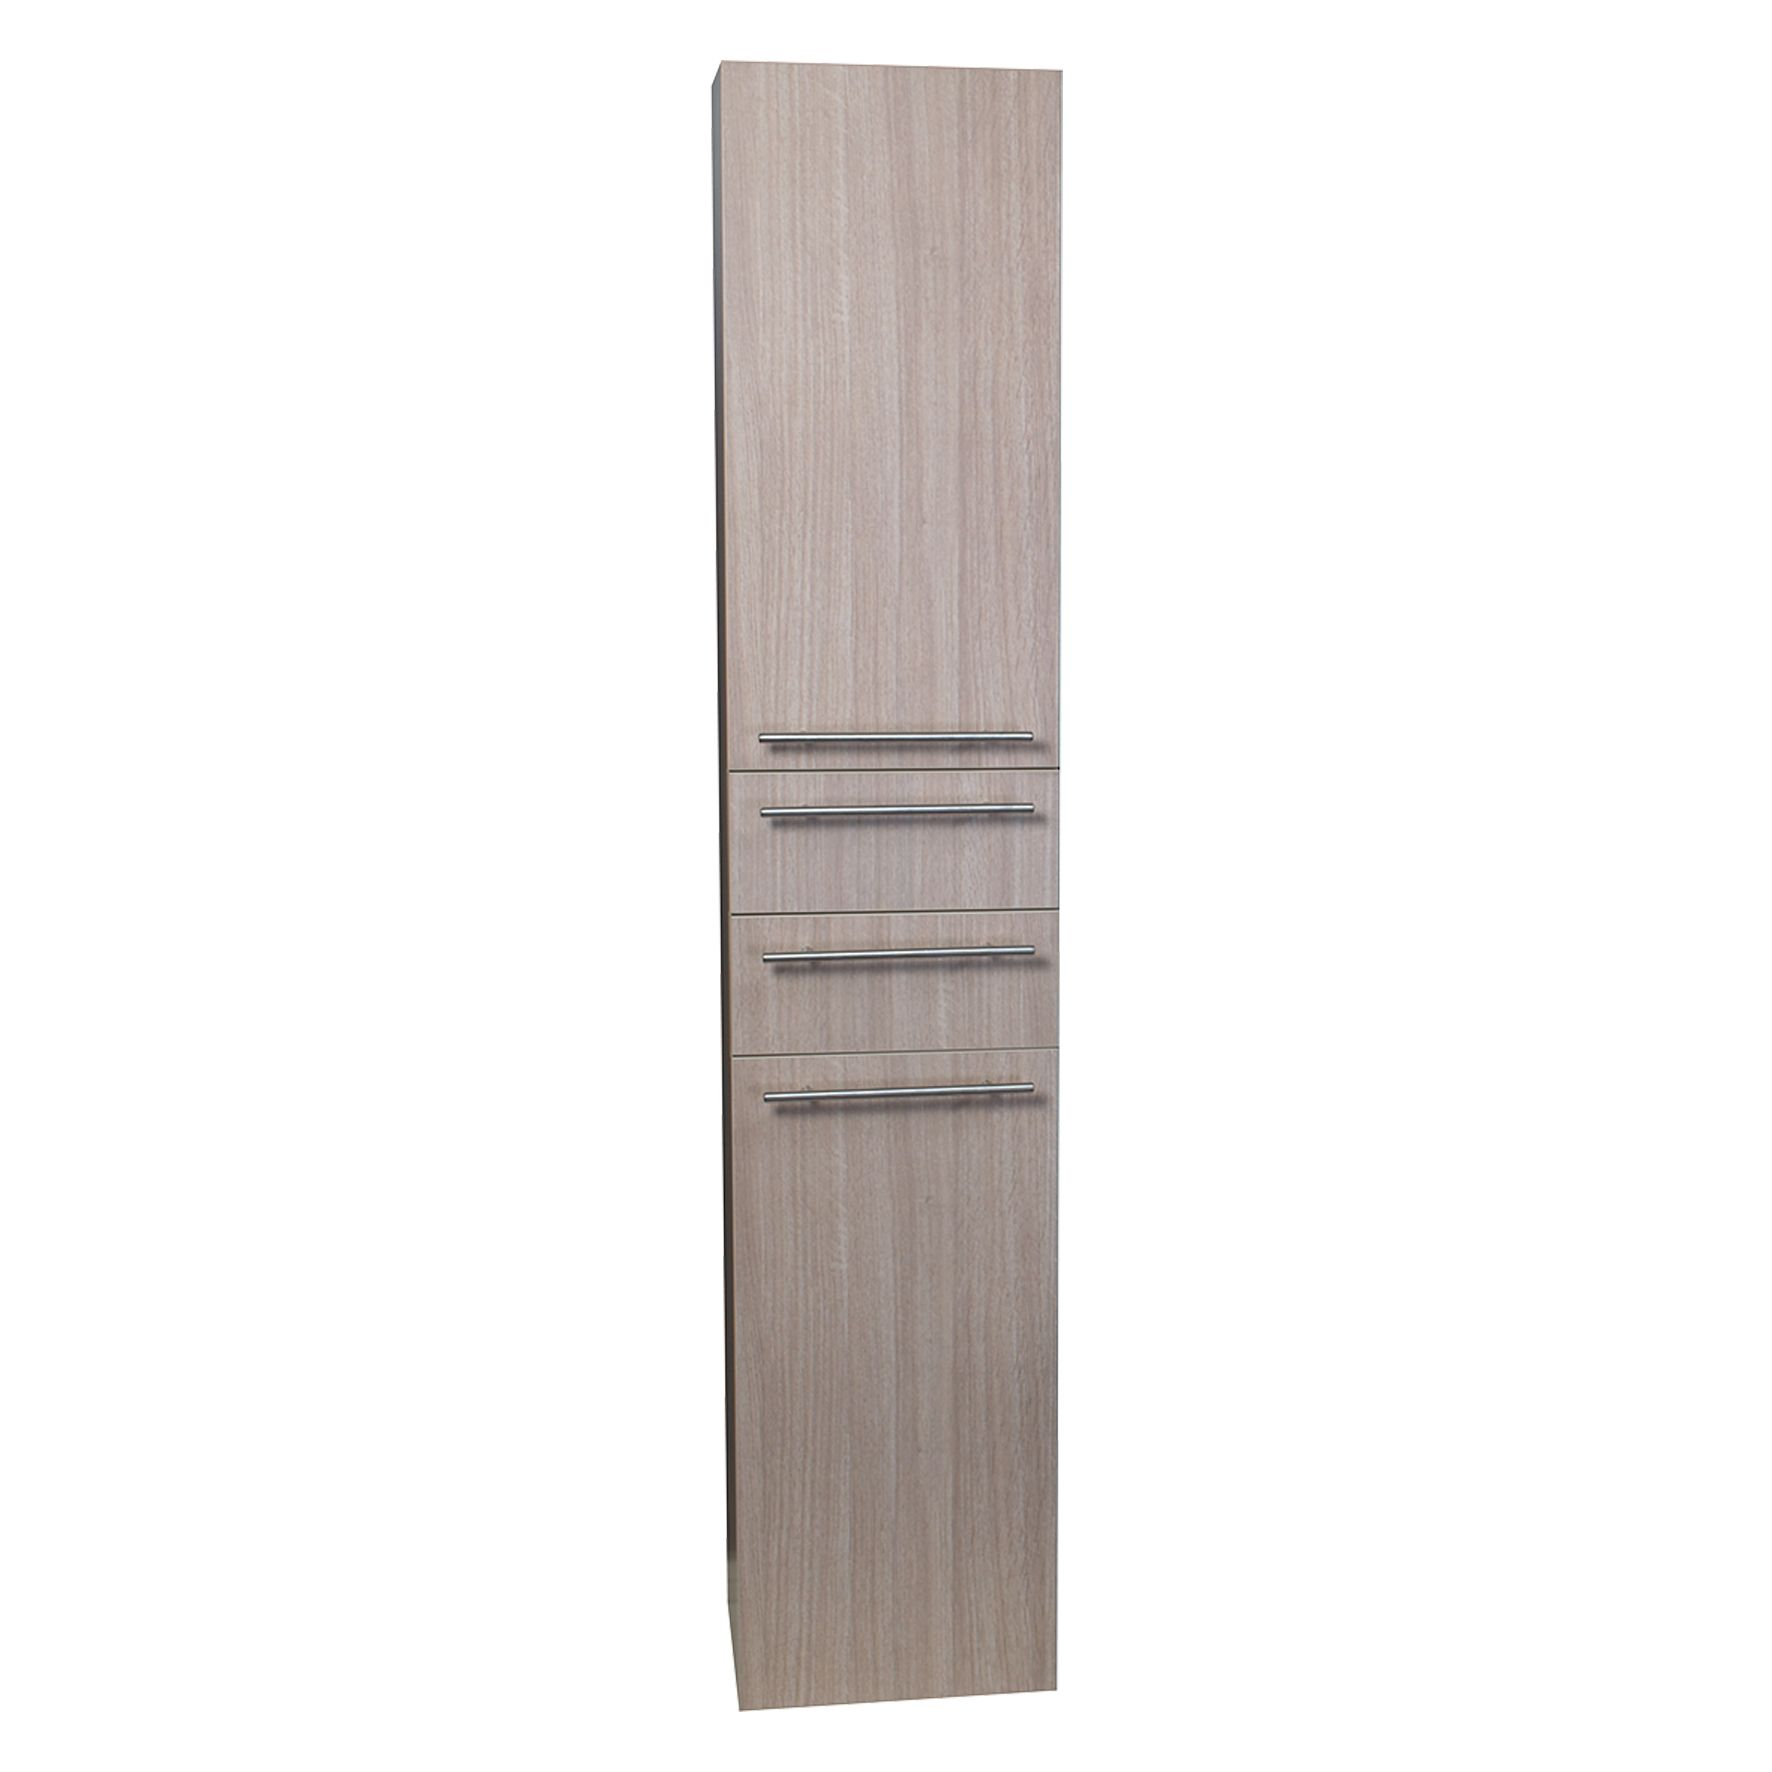 Differnz hoge kolomkast Force 176x35x30cm rechts eiken